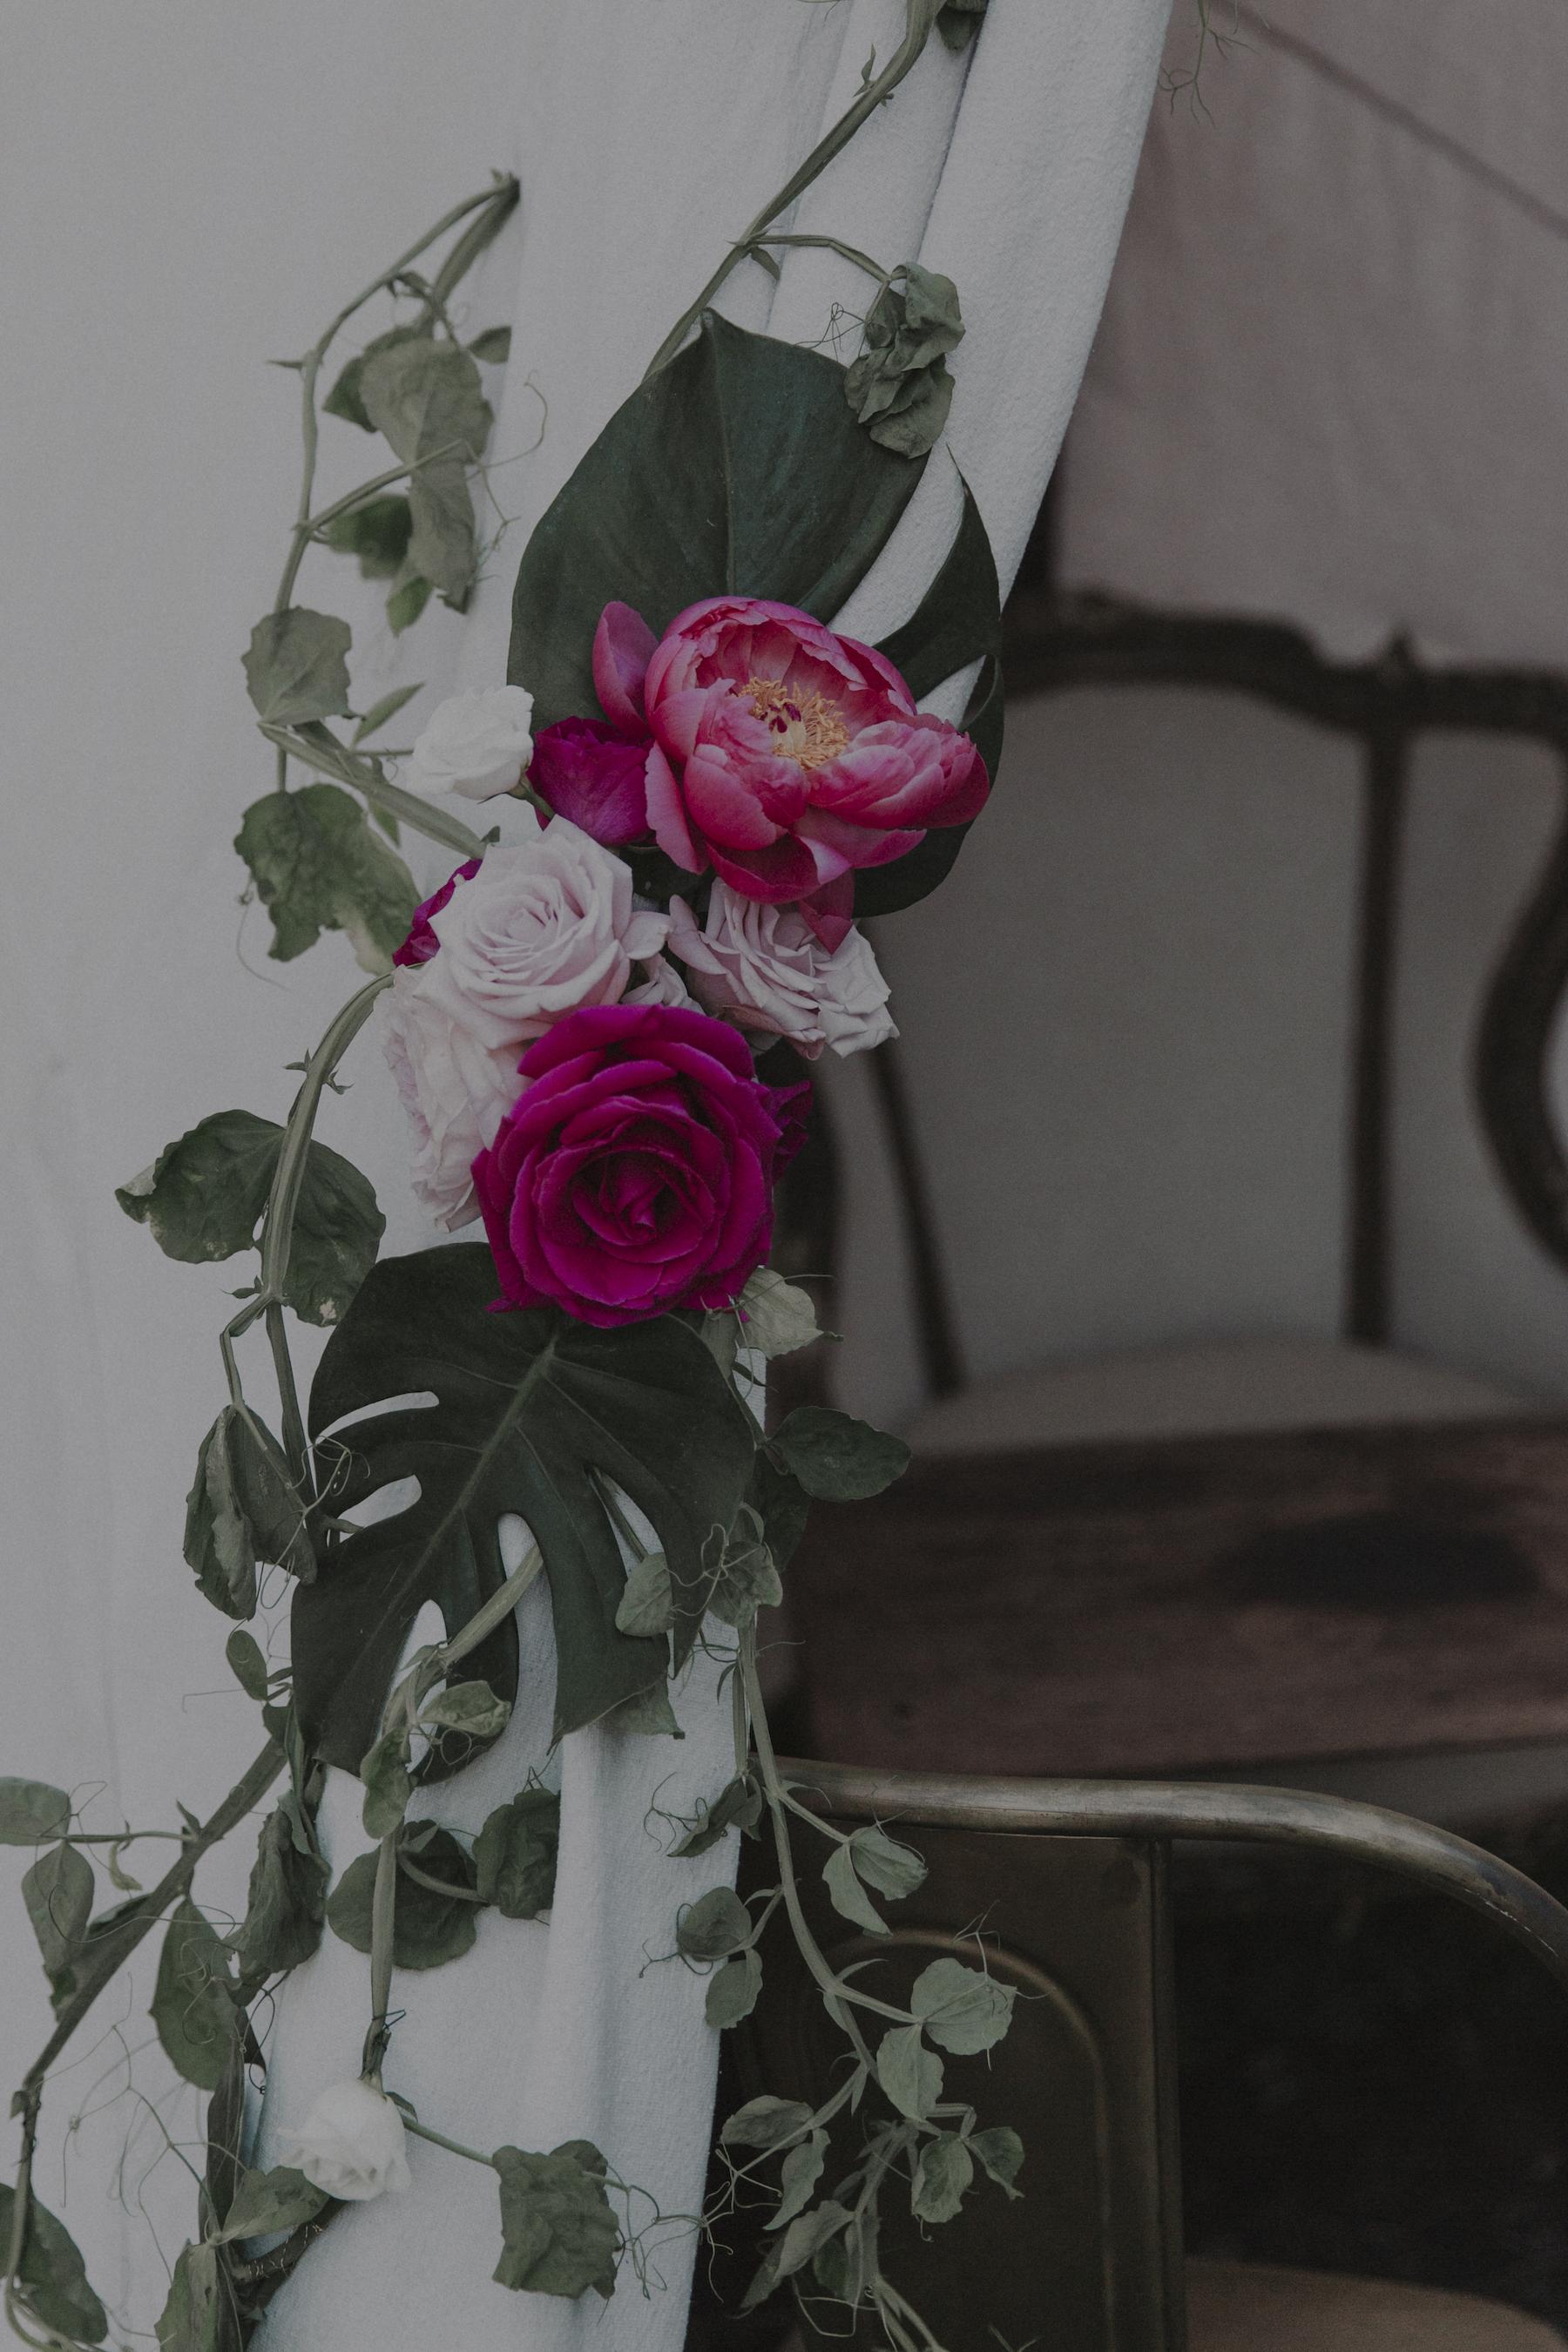 barr-mansion-wedding-austin-texas8858.JPG